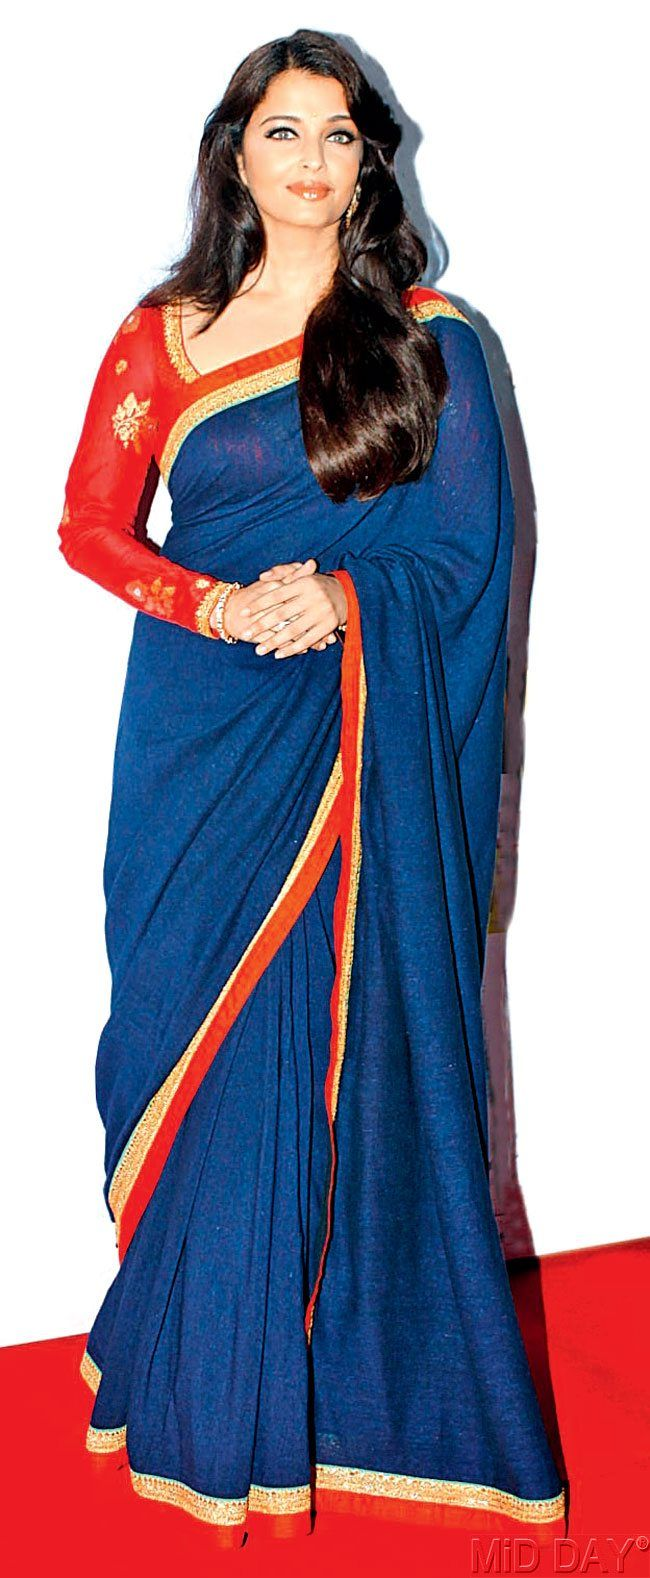 Aishwarya Rai Bachchan at the opening ceremony of the 16th Mumbai Film Festival. #Bollywood #Fashion #Style #Beauty